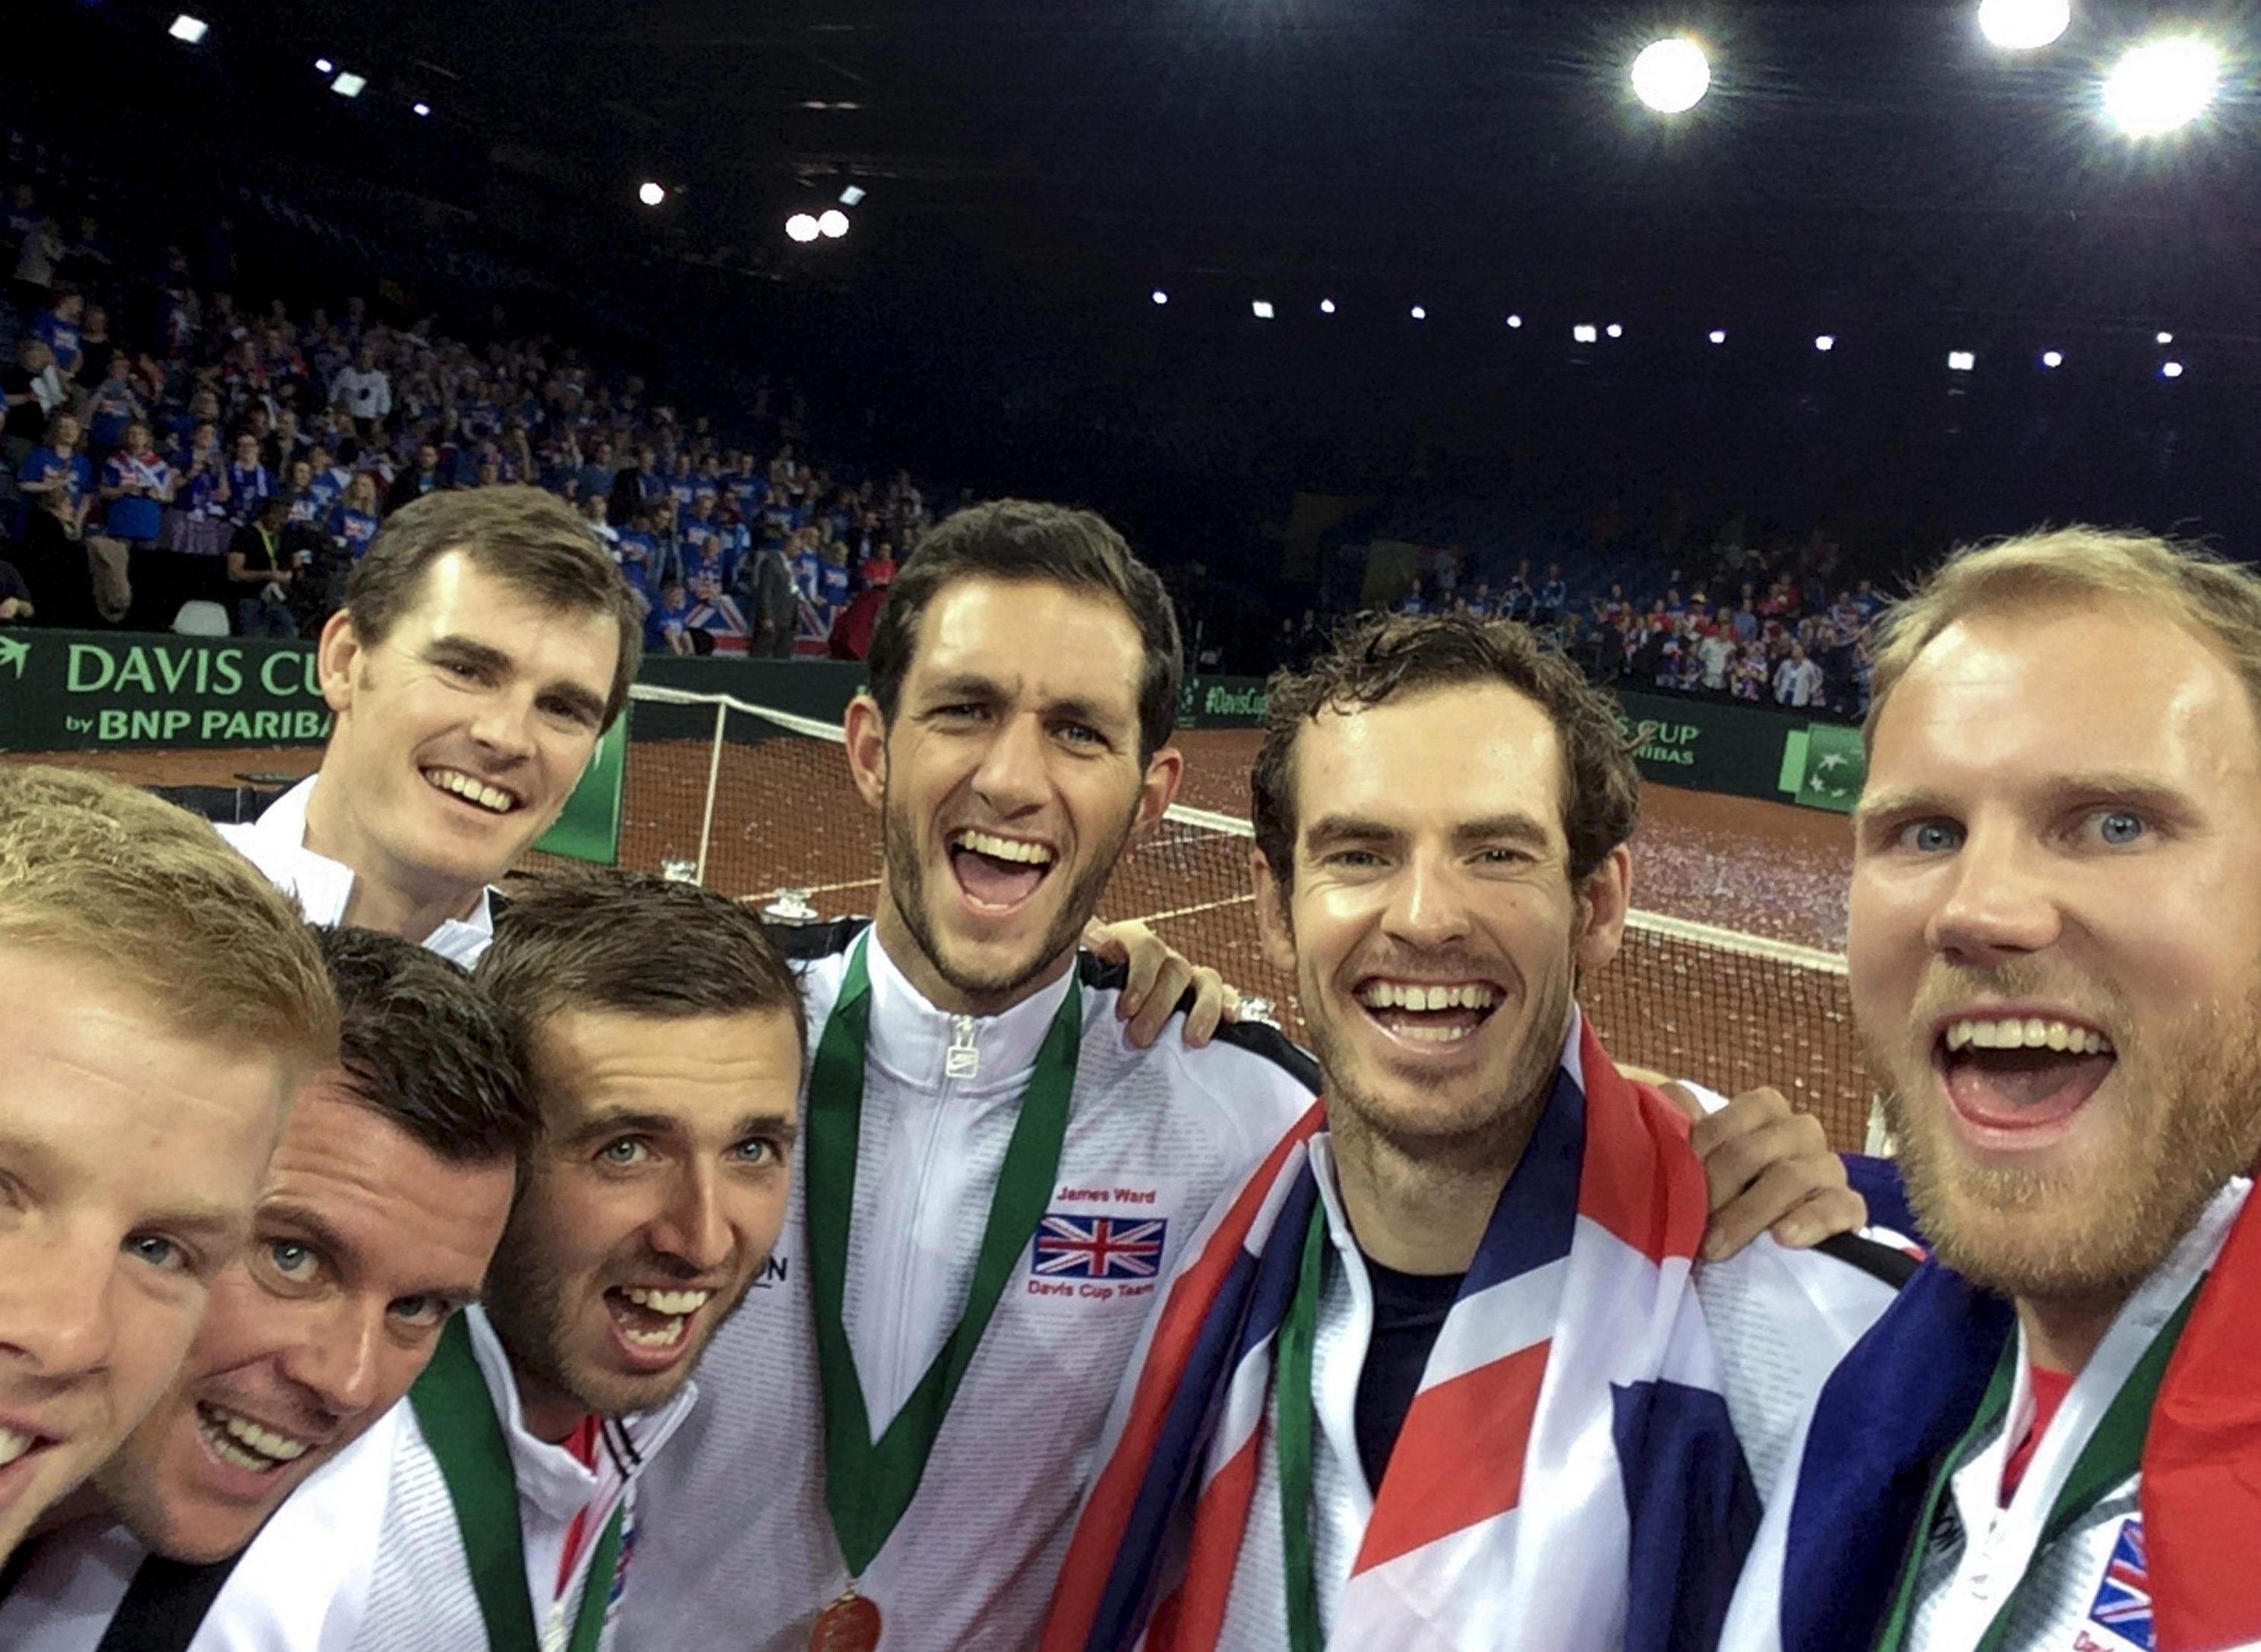 Dan Evans revealed not one of his Davis Cup team-mates spoke to him after drugs shame